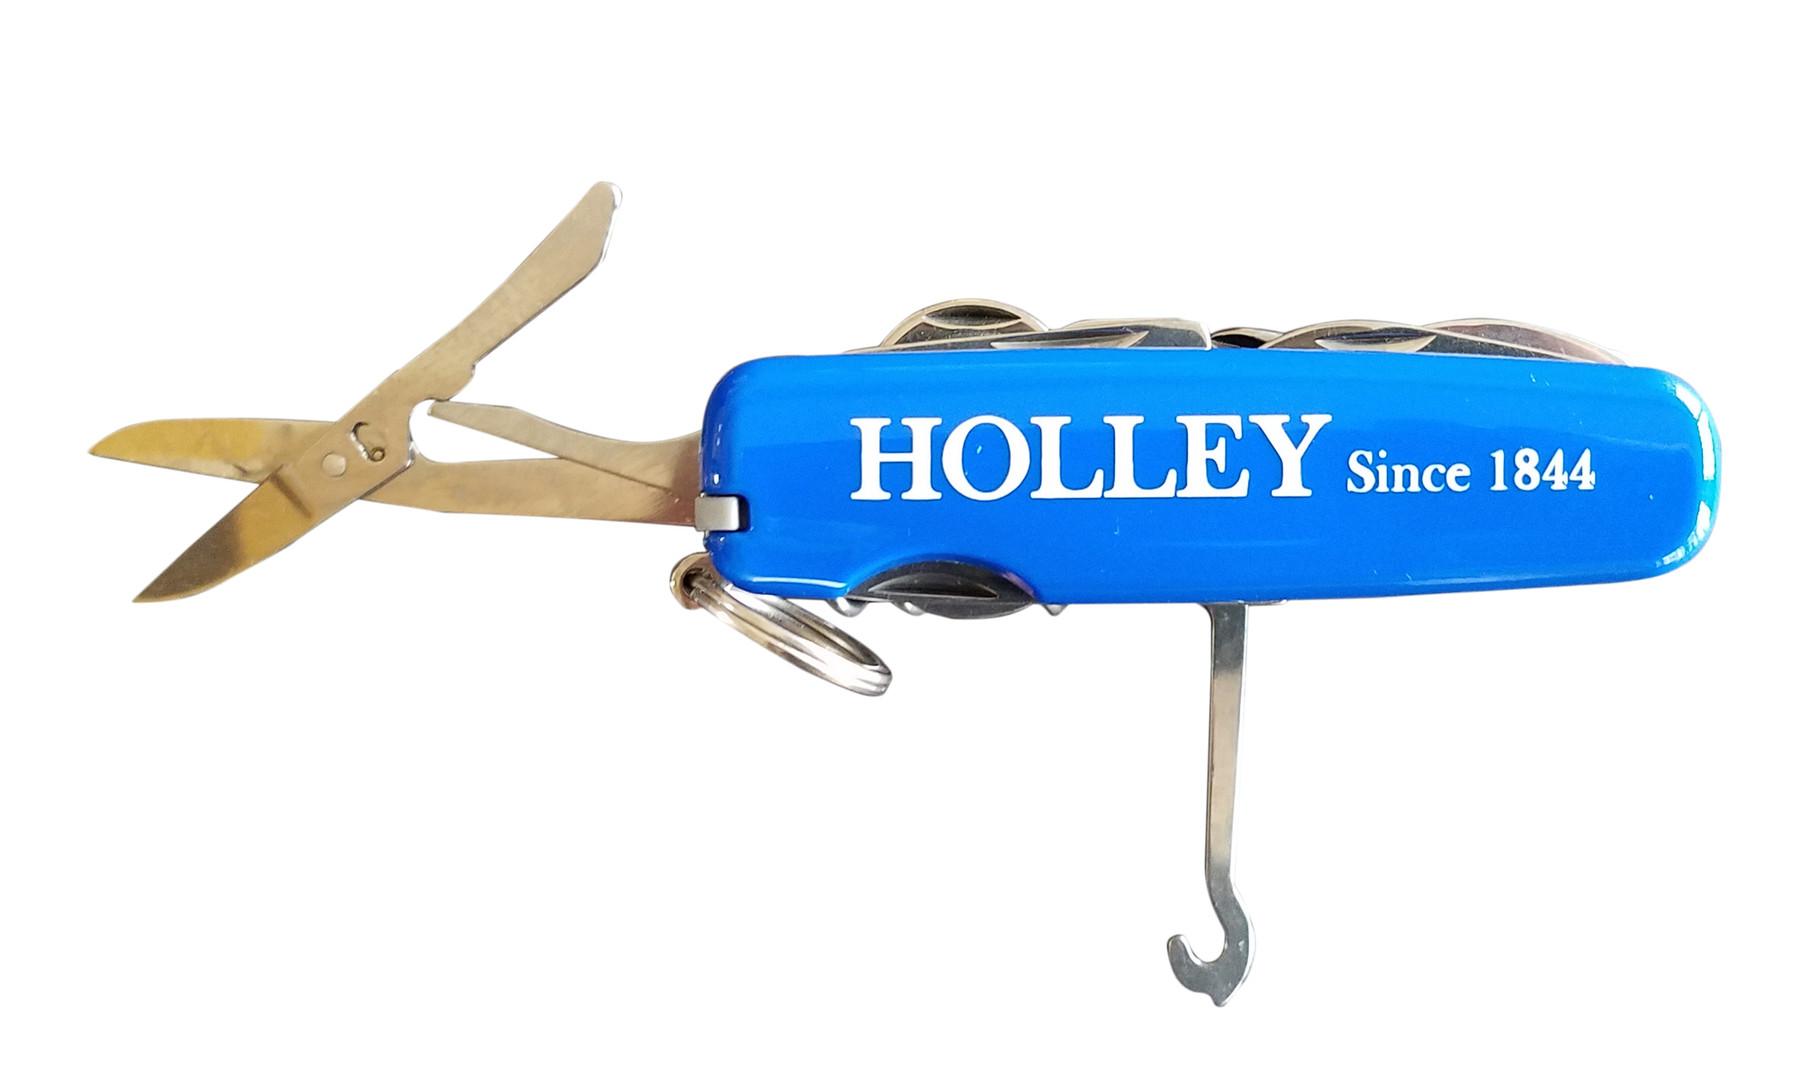 Scissors & Hook Tool